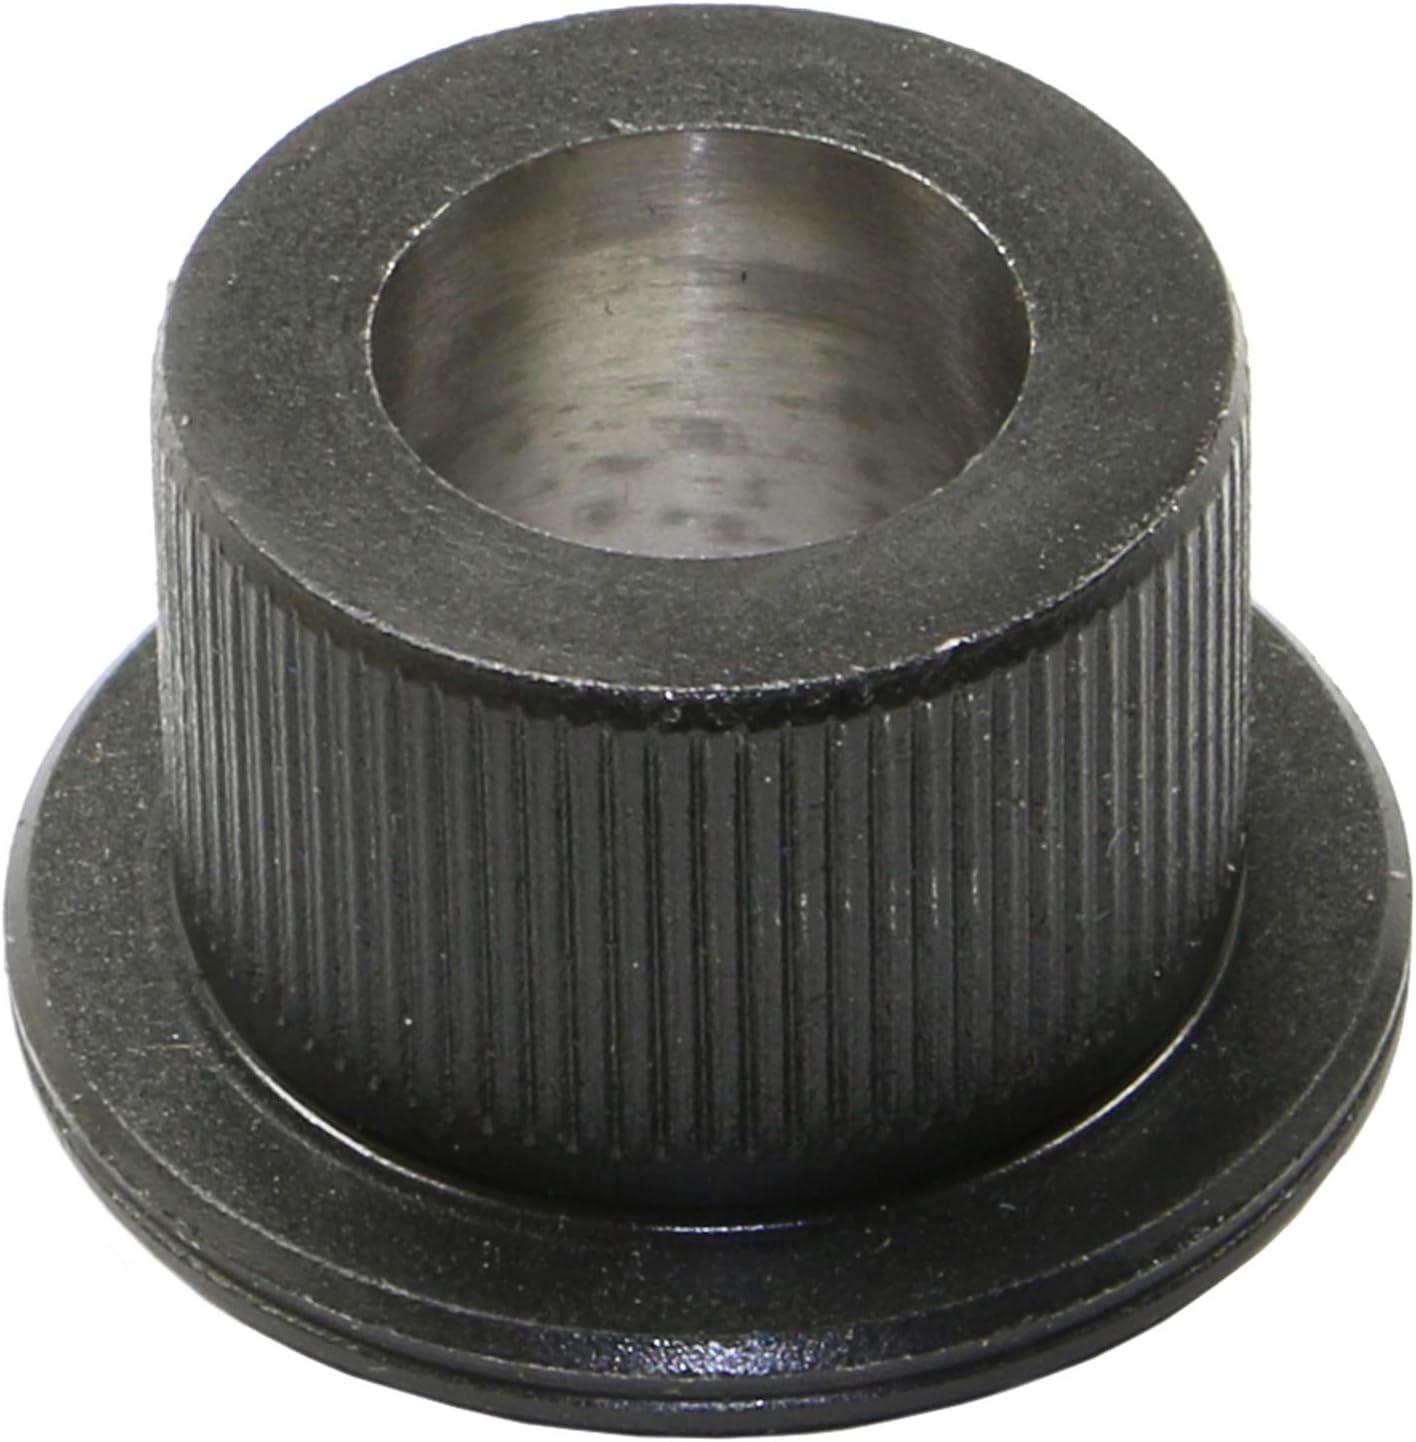 MOOG K150403 Steering Knuckle Award Pack Regular discount 1 Insert